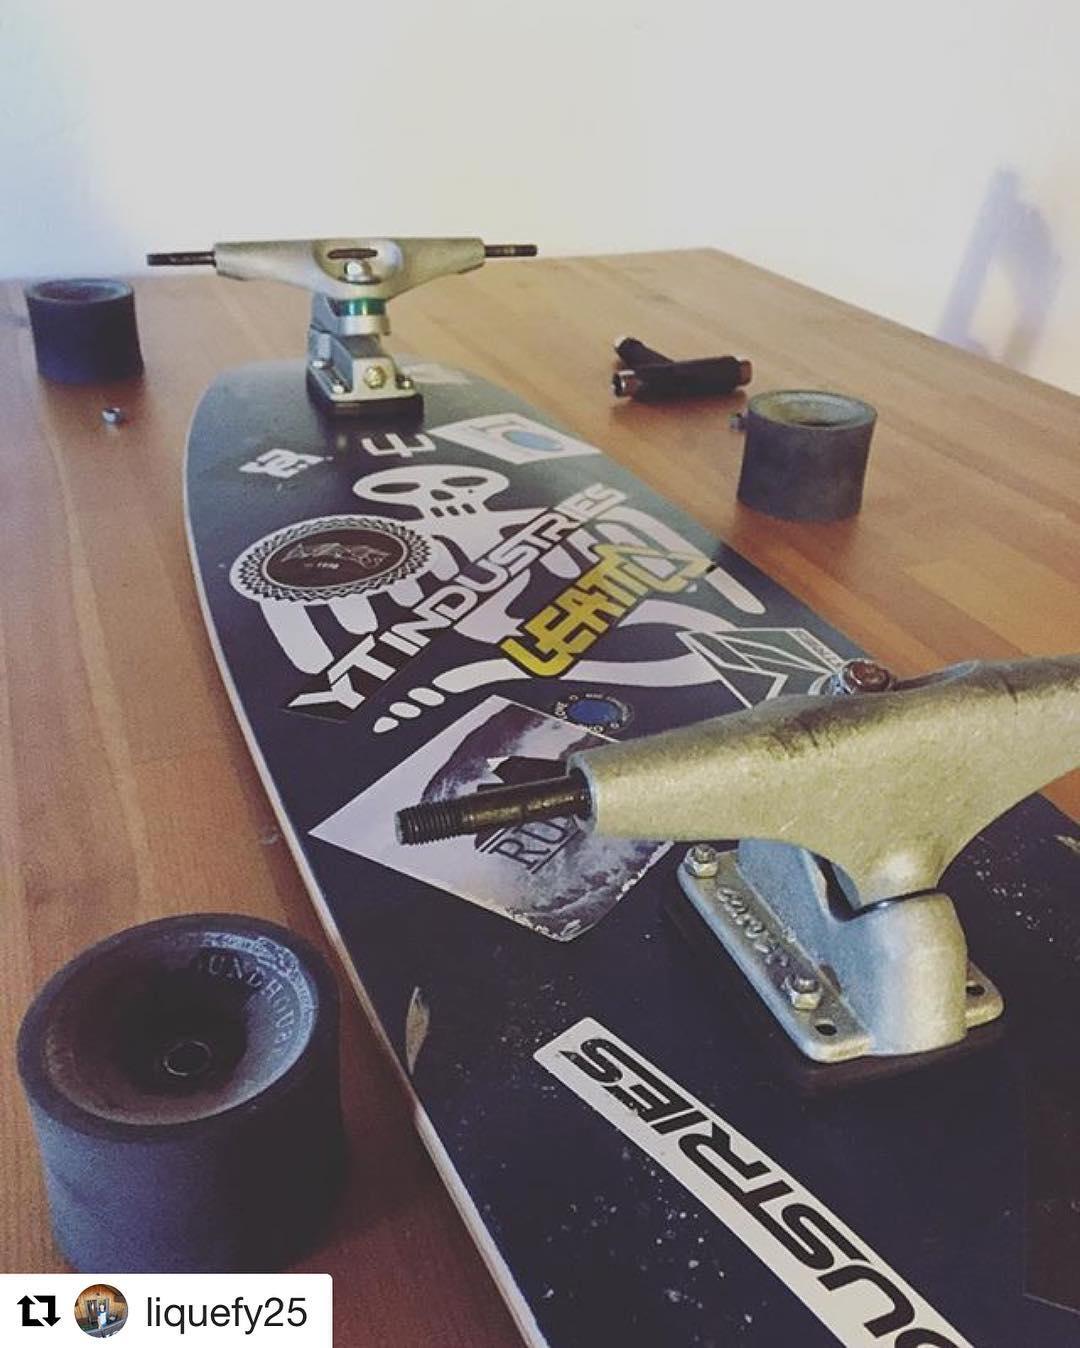 #Repost @liquefy25 with @repostapp ・・・ Skateboard säubern